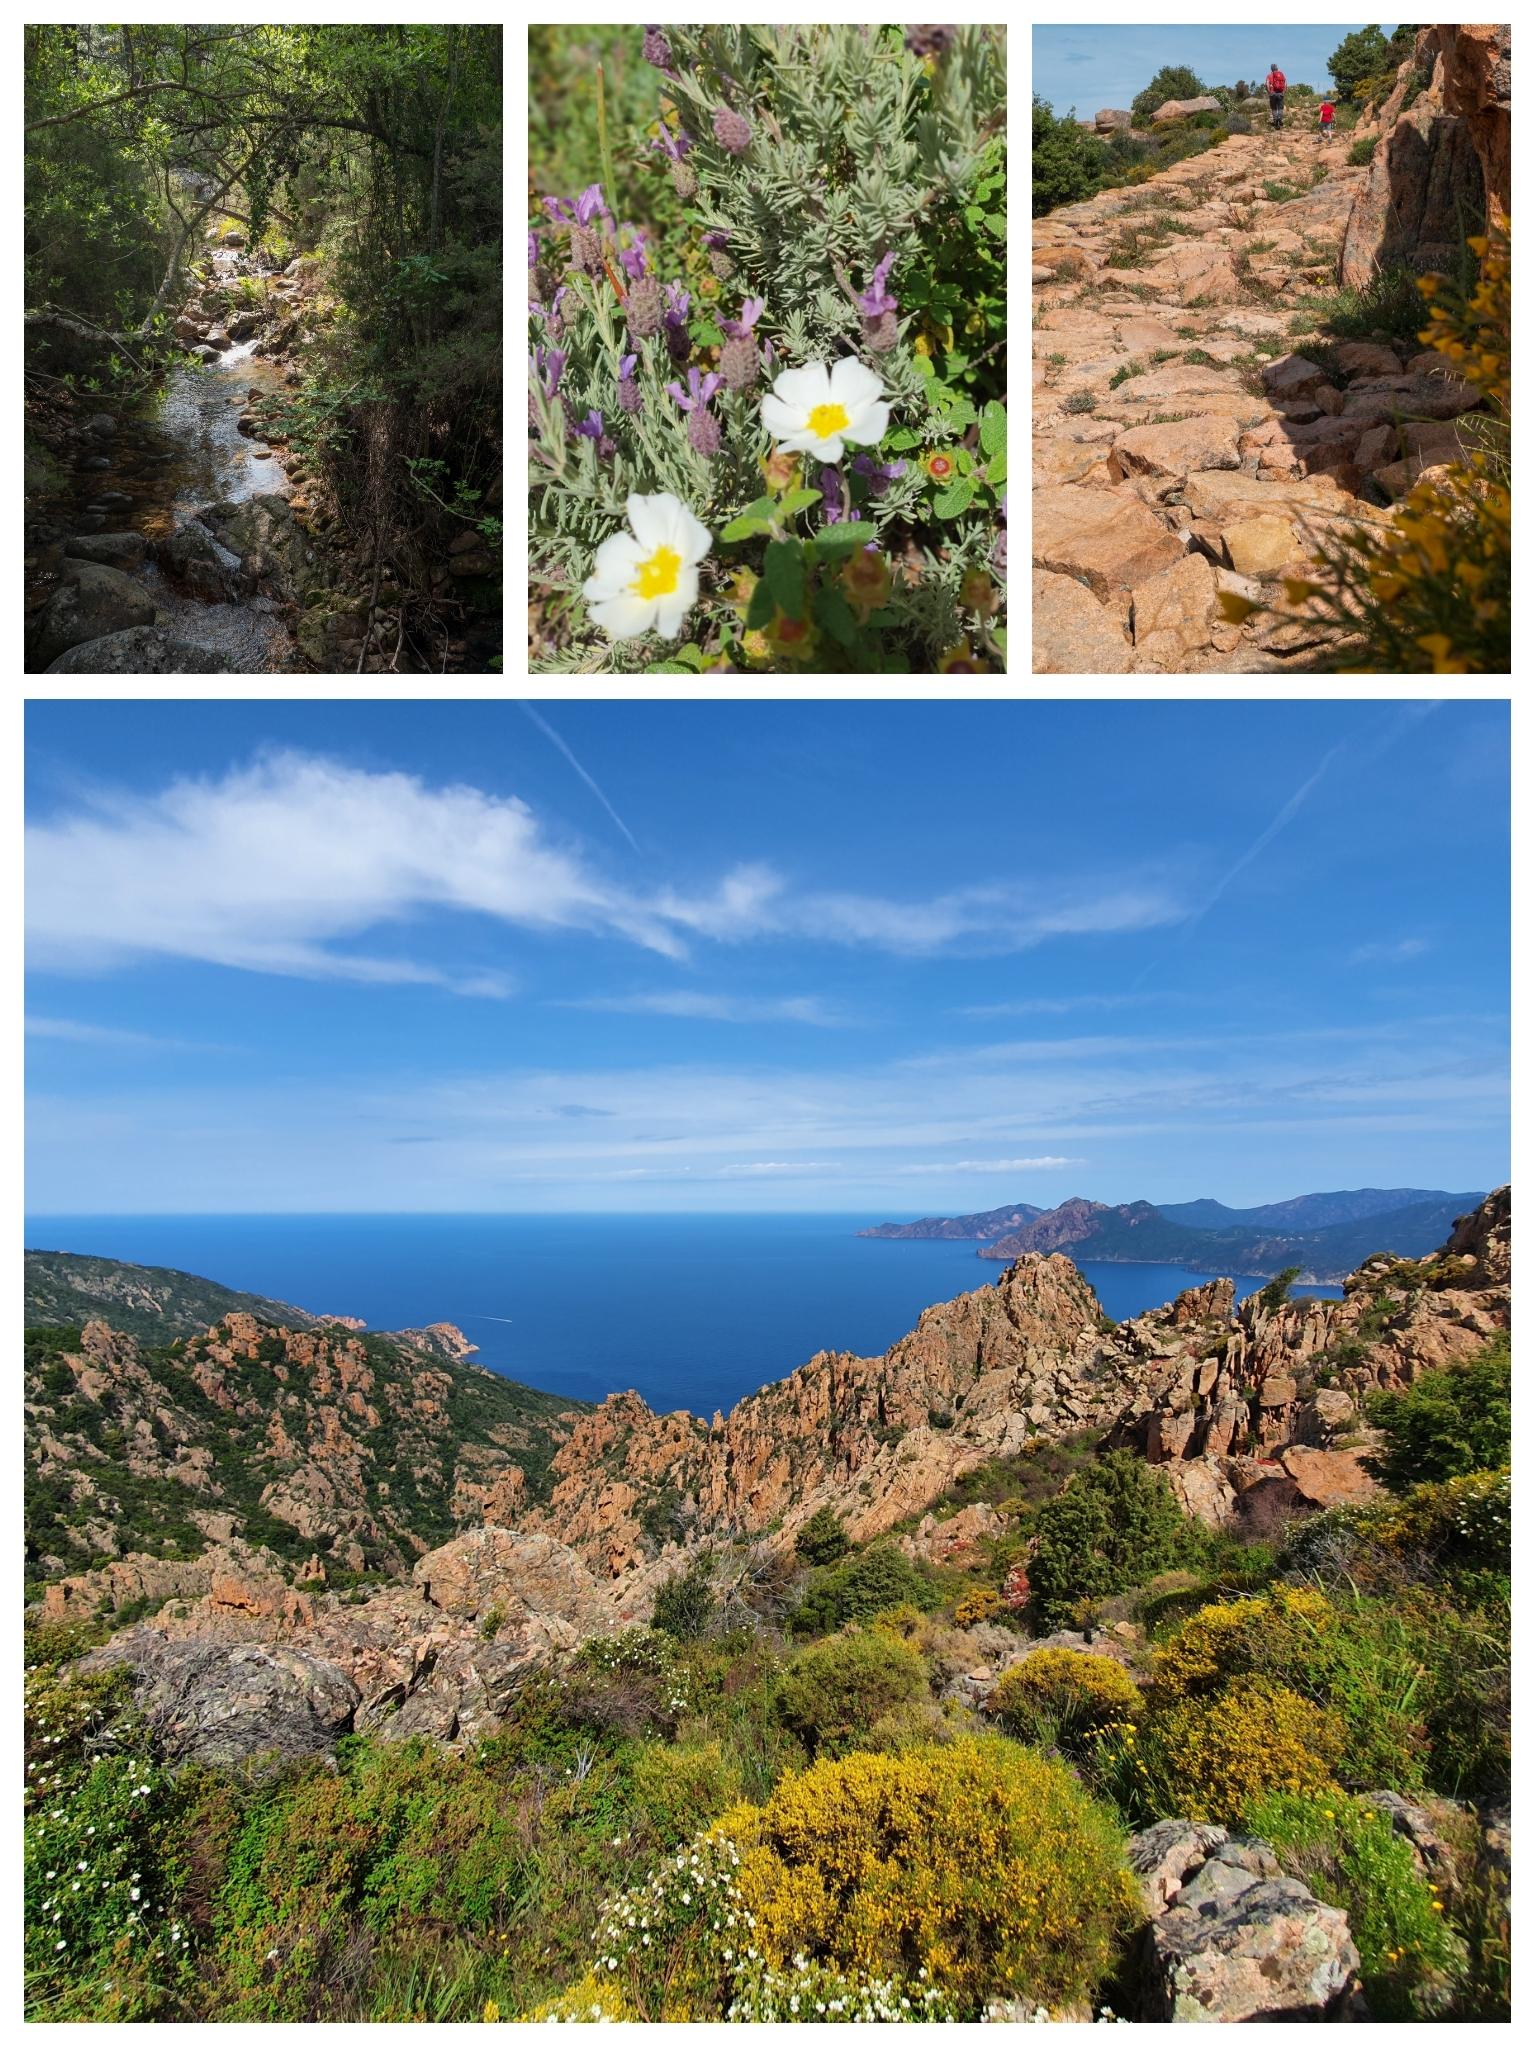 Randonnées dans les calanques de Piana, Corse du Sud